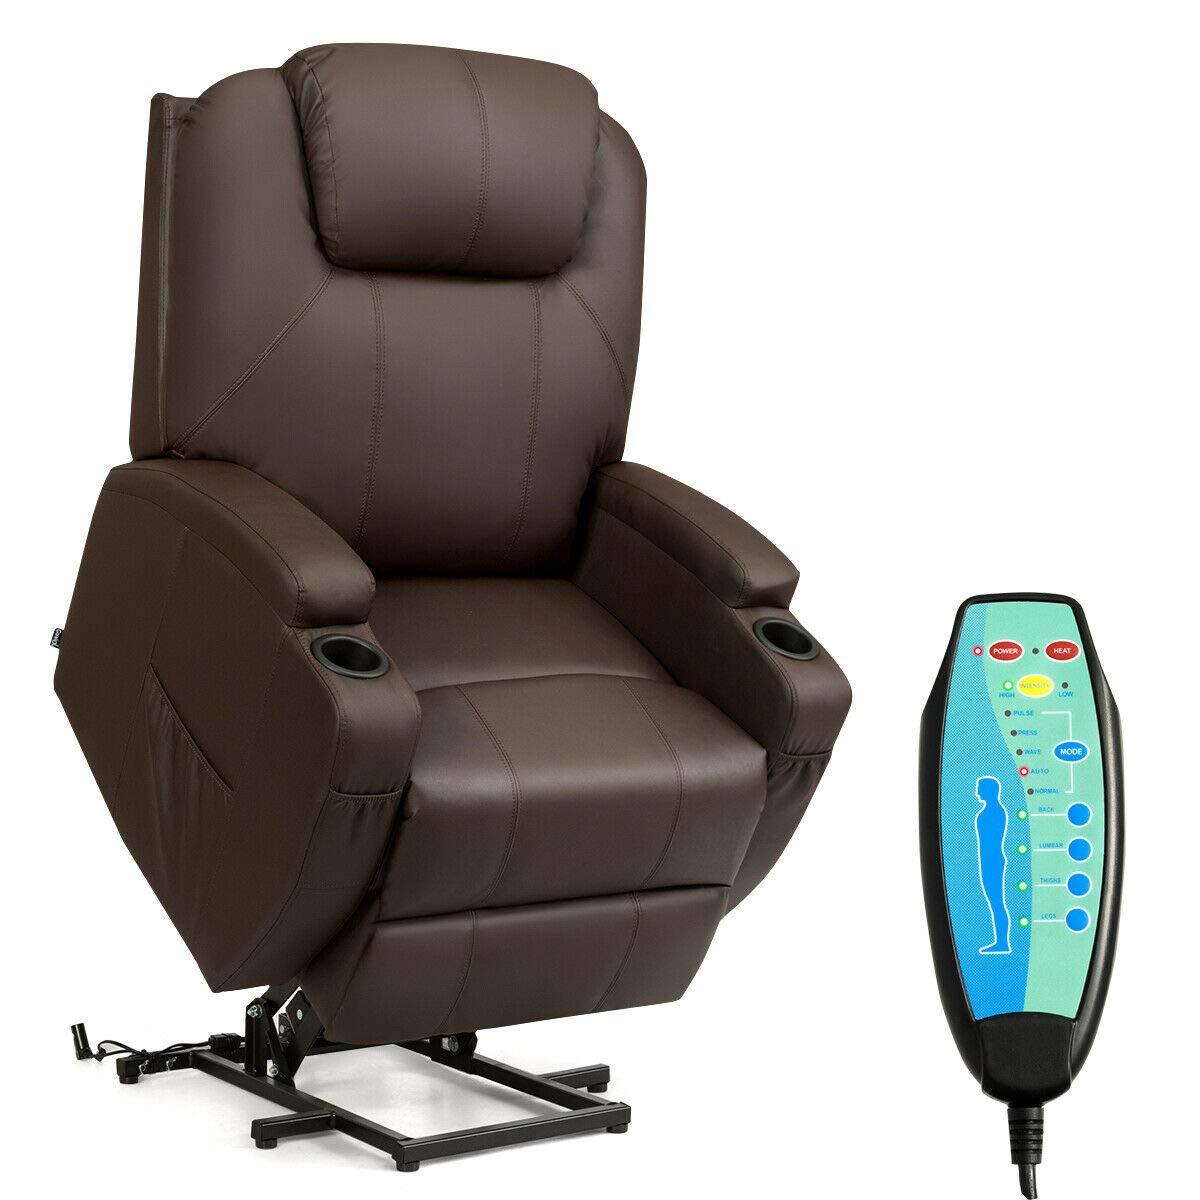 TANGKULA Massage Recliner